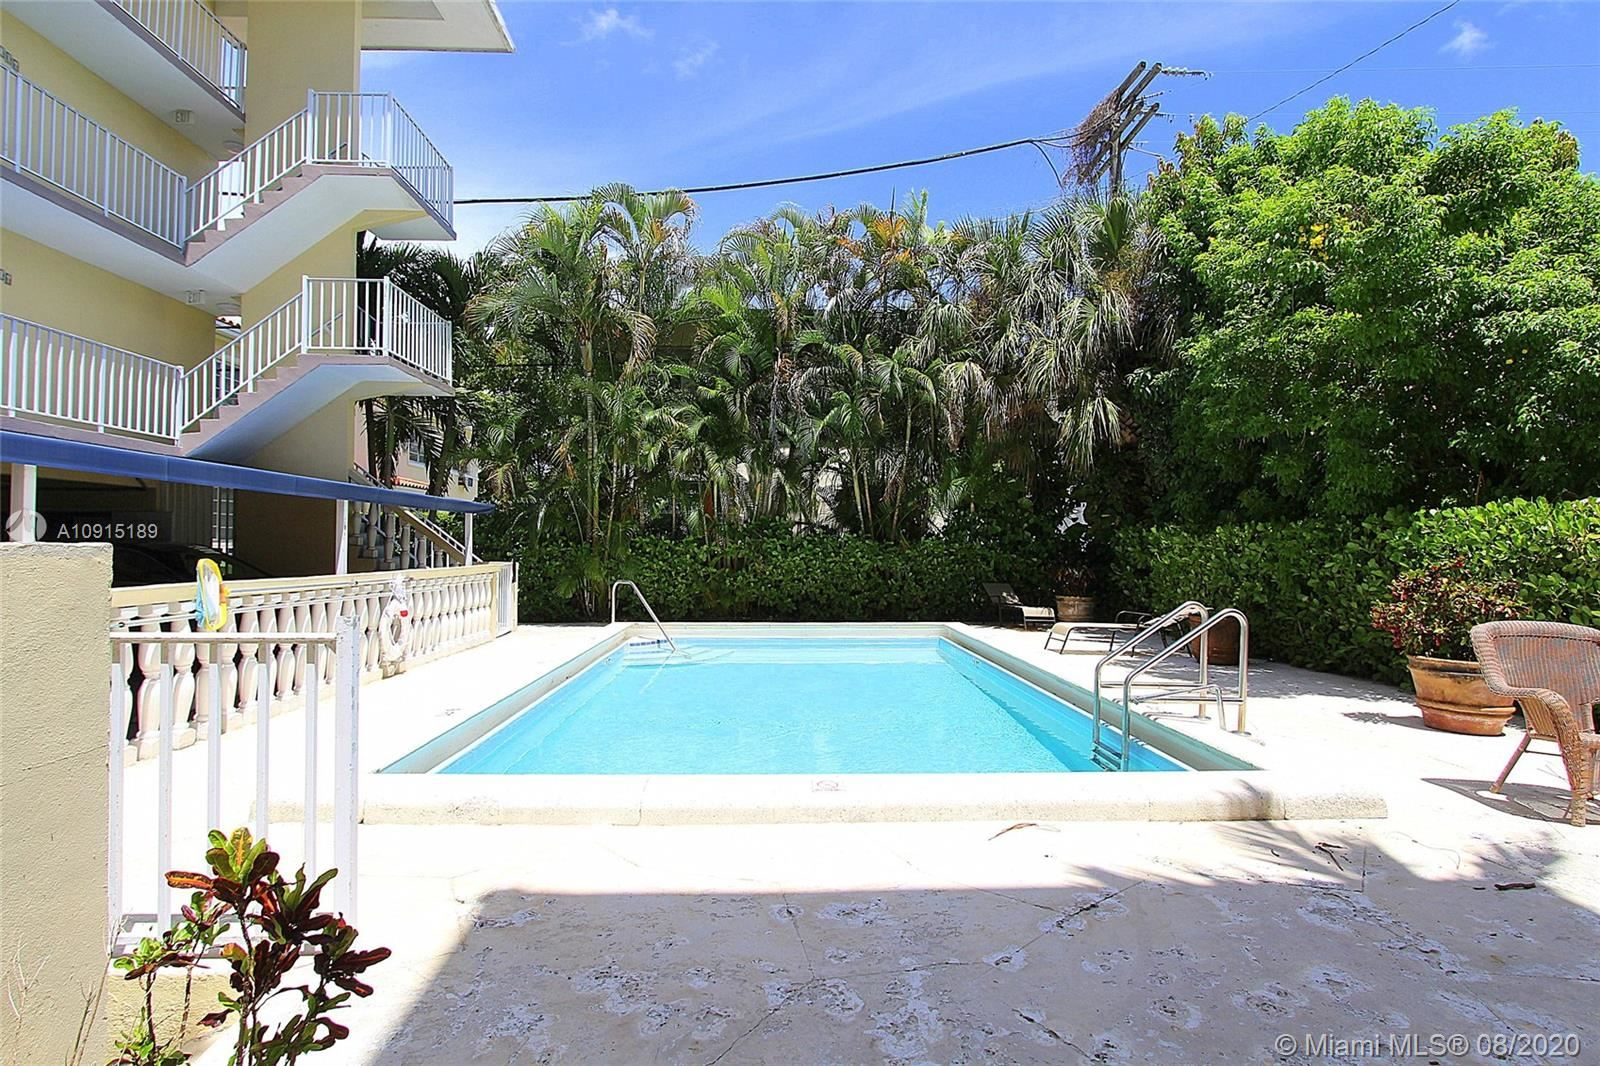 427 Santander Ave #405, Coral Gables, FL 33134 - #: A10915189